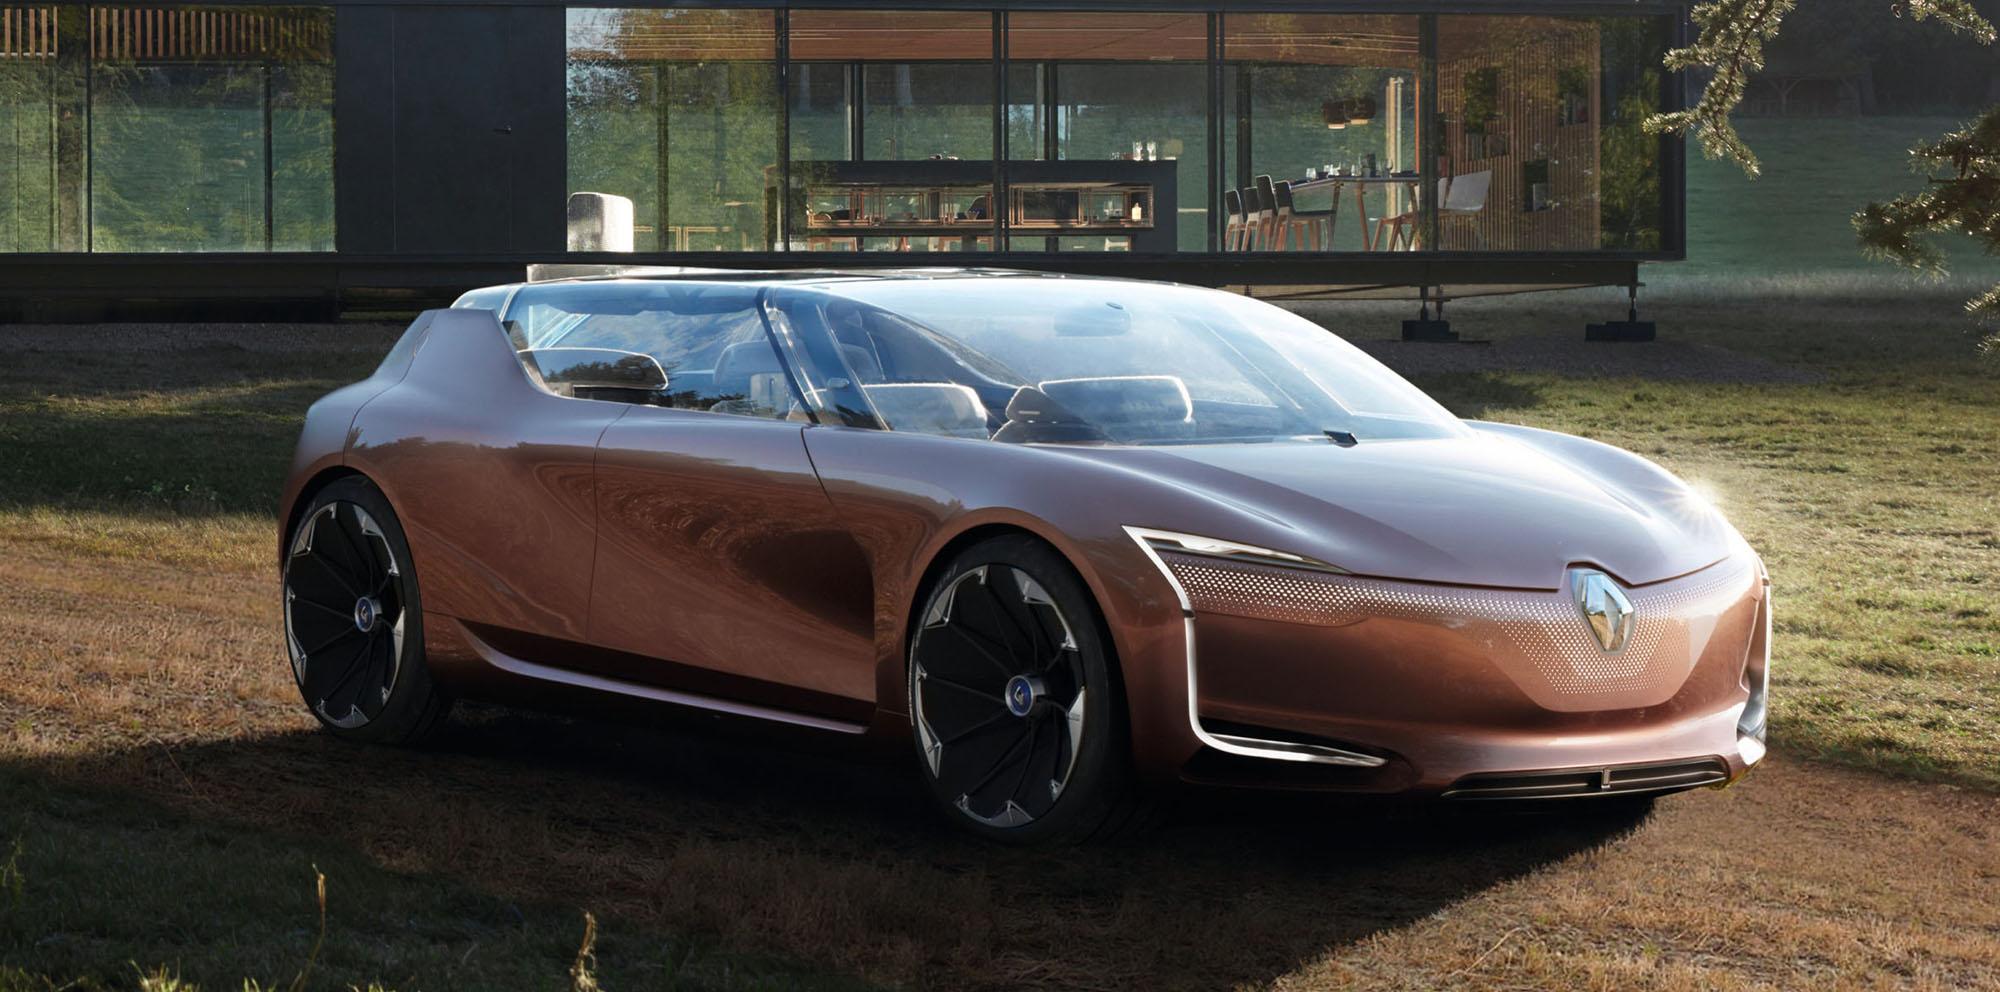 Renault Symbioz house and autonomous car concept unveiled ...